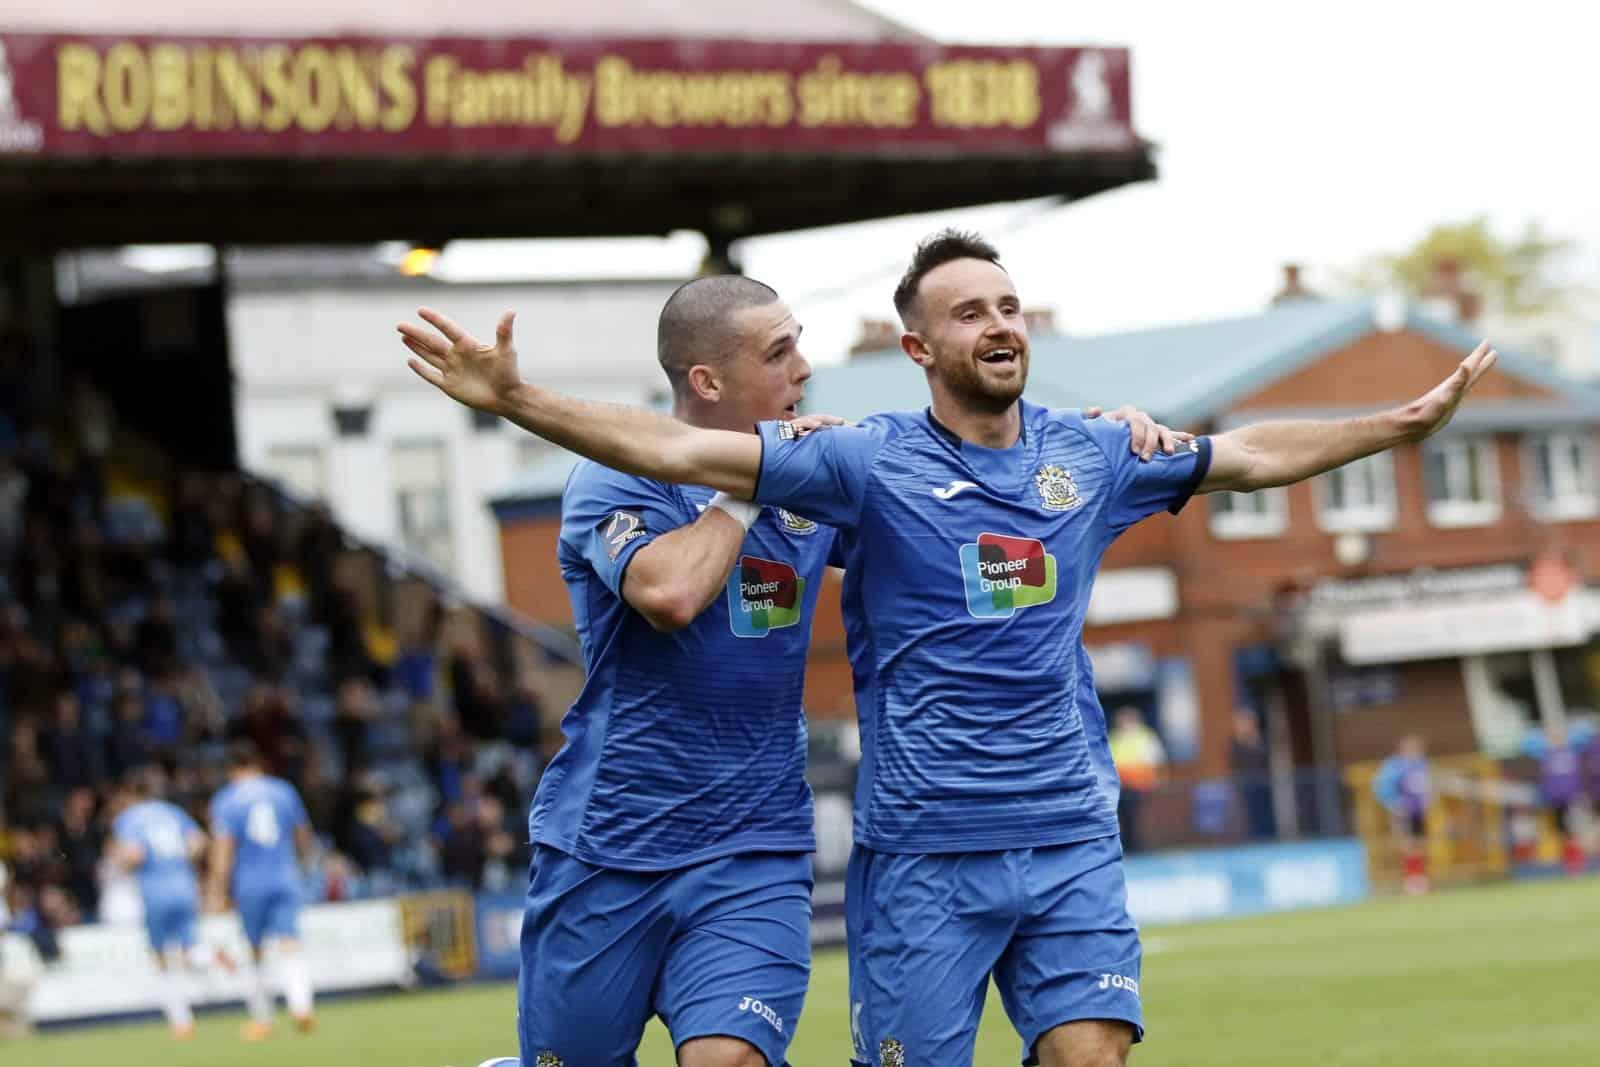 Matty Warburton, Stockport County FC 2-0 Altrincham FC, Emirates FA Cup